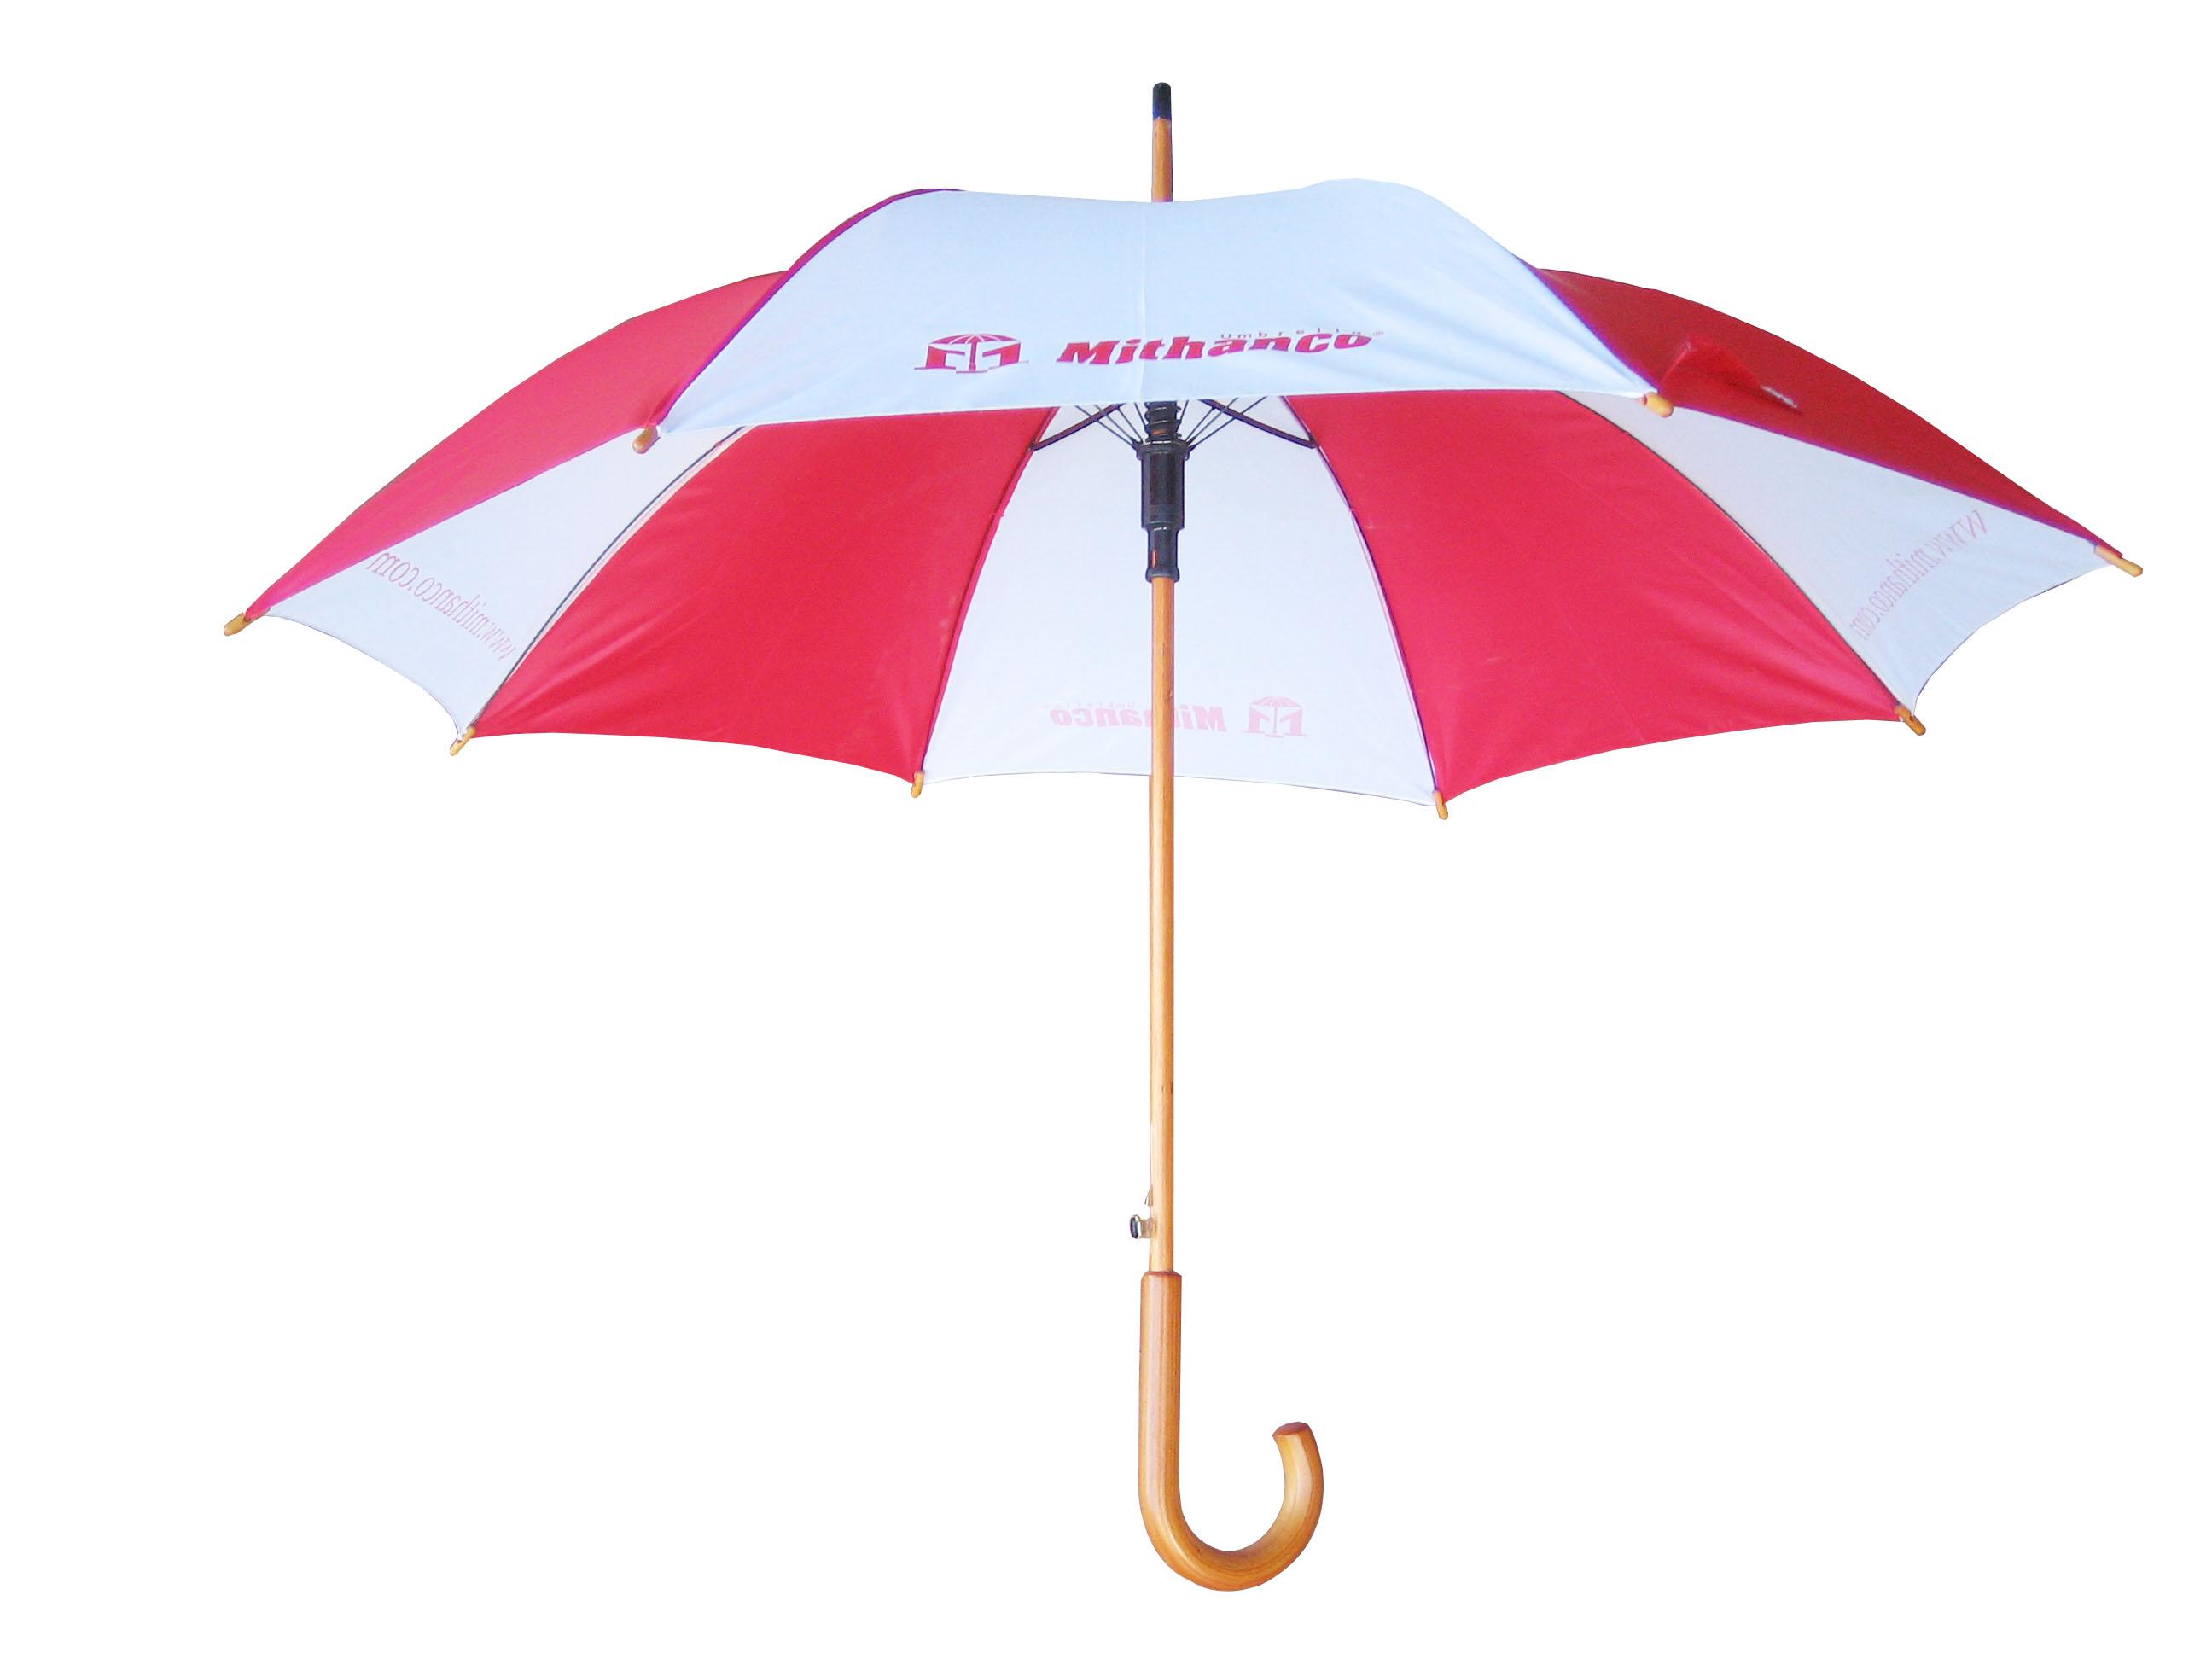 Handheld umbrella